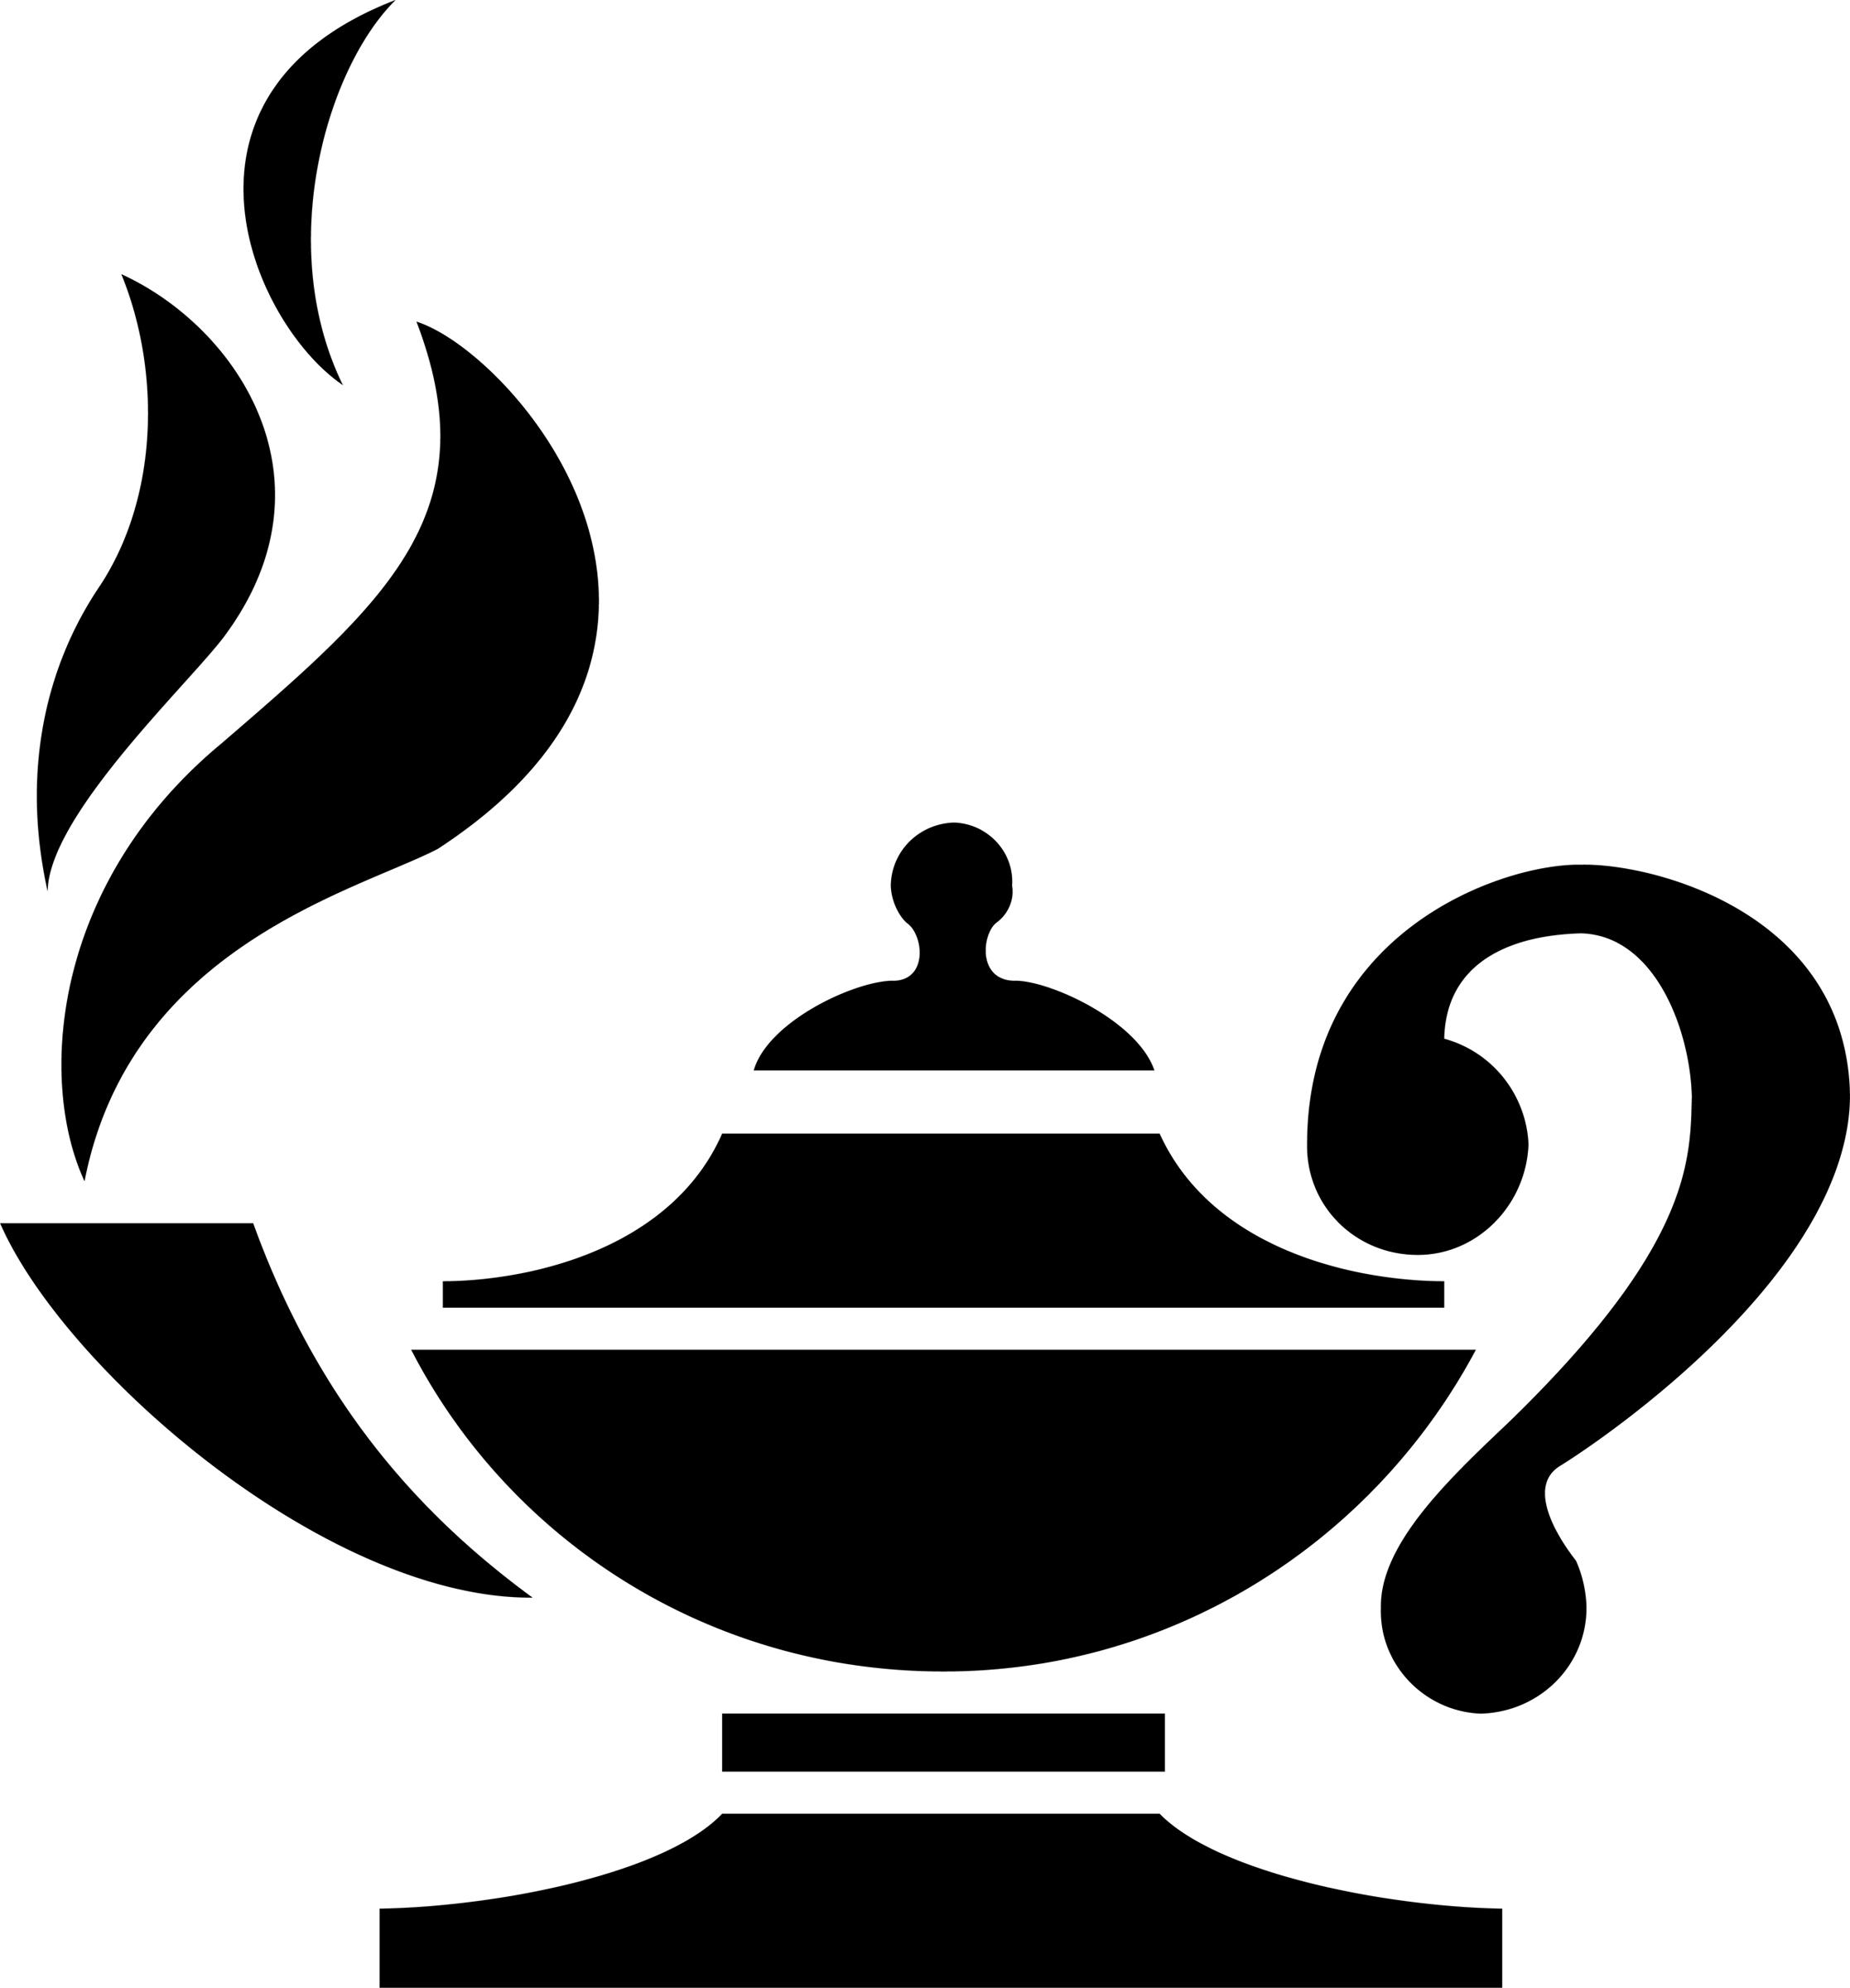 Lamp clipart knowledge. Nursing suggest symbol of